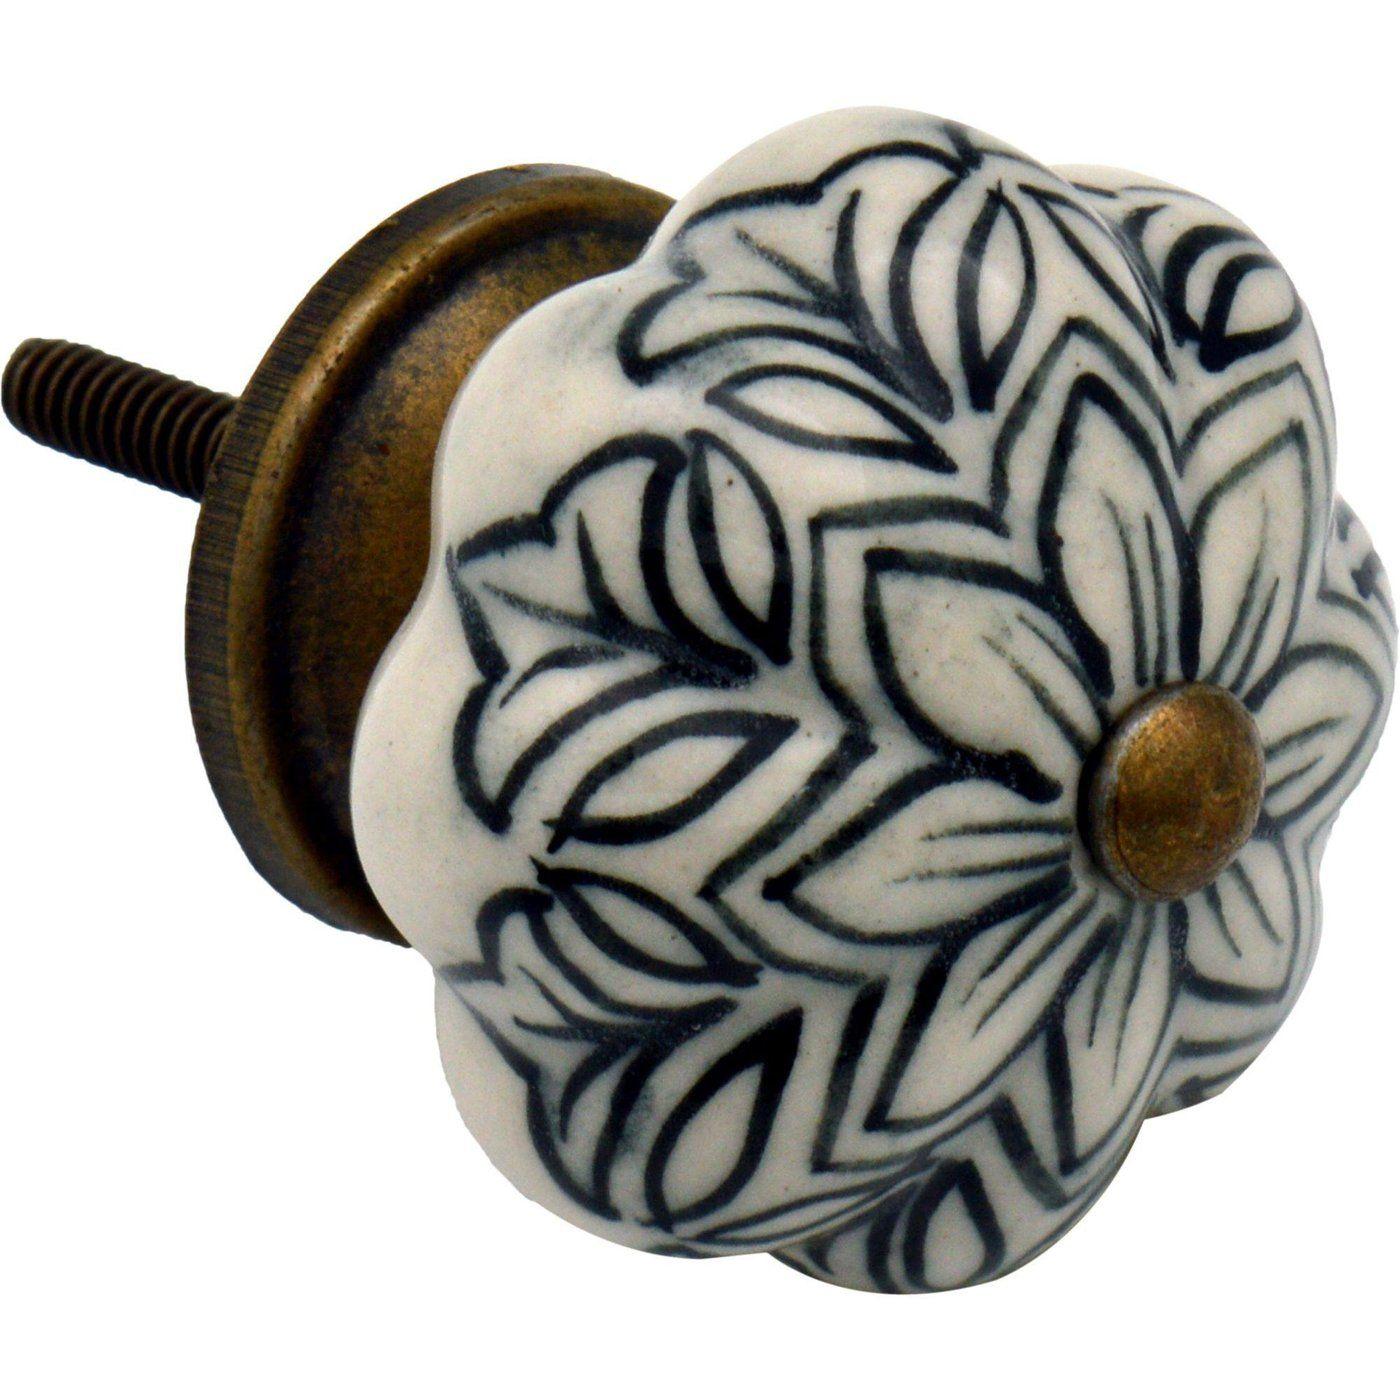 Nicola Spring Ceramic Cupboard Drawer Knob - Vintage Flower Design ...